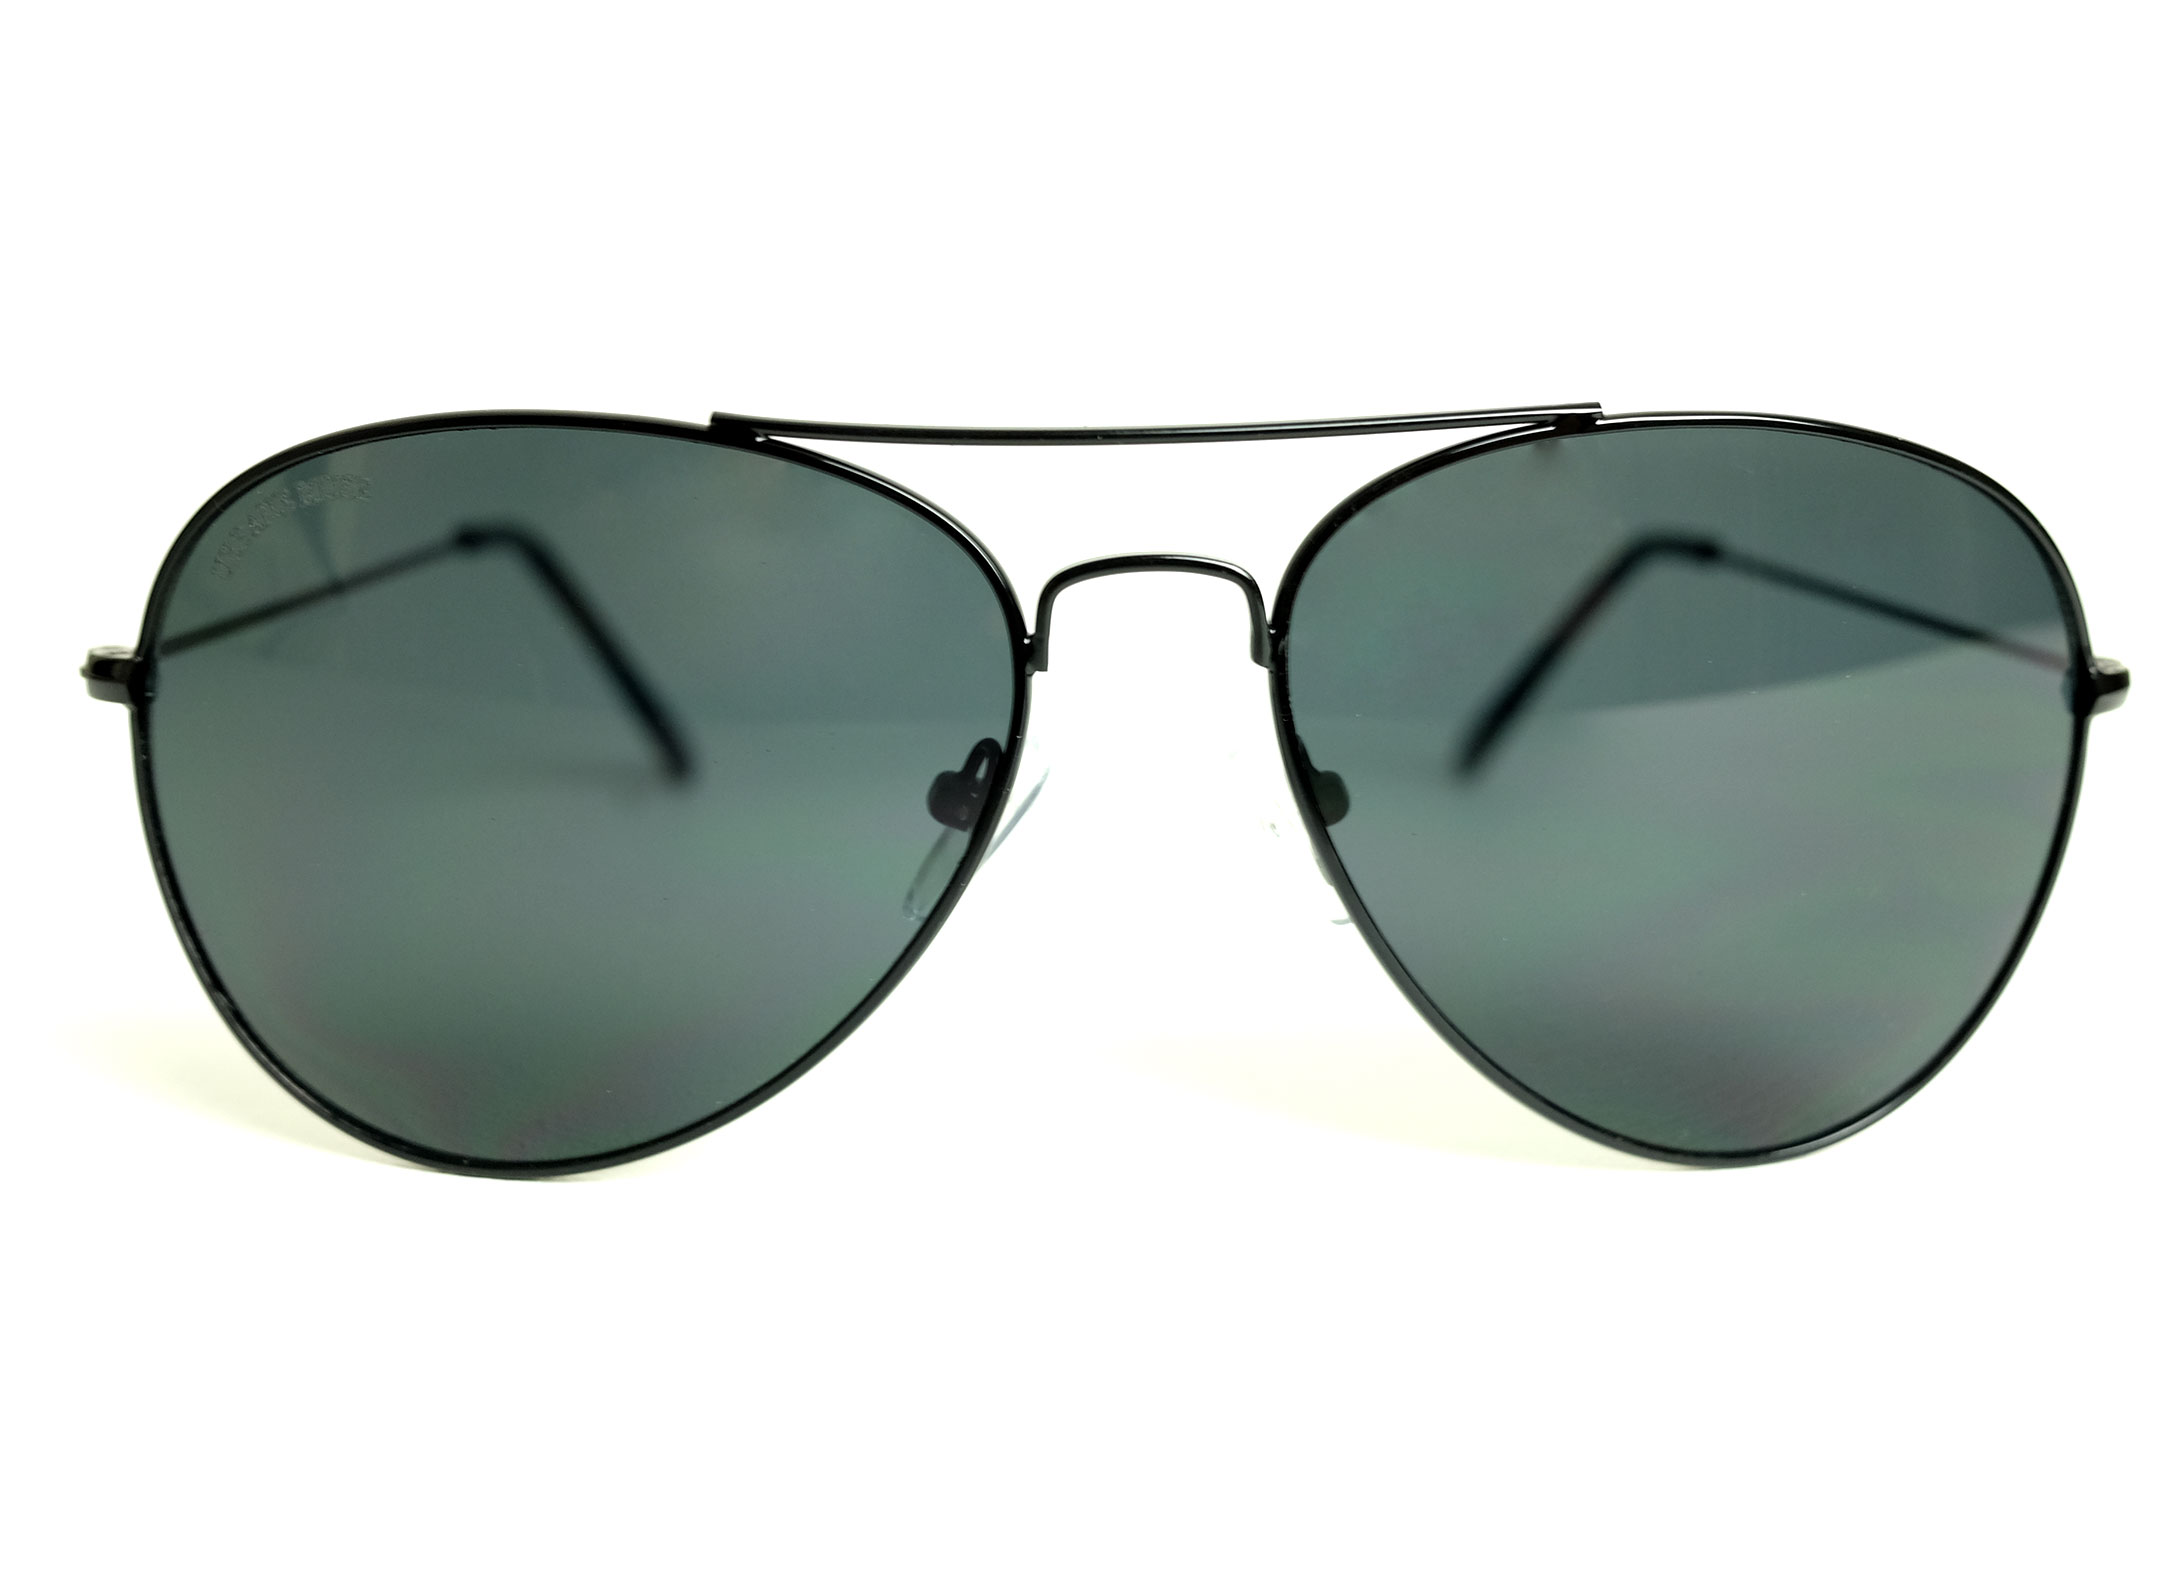 Black Metal Frame Aviator Sunglasses with Gray lens – URBANE MUSE ...